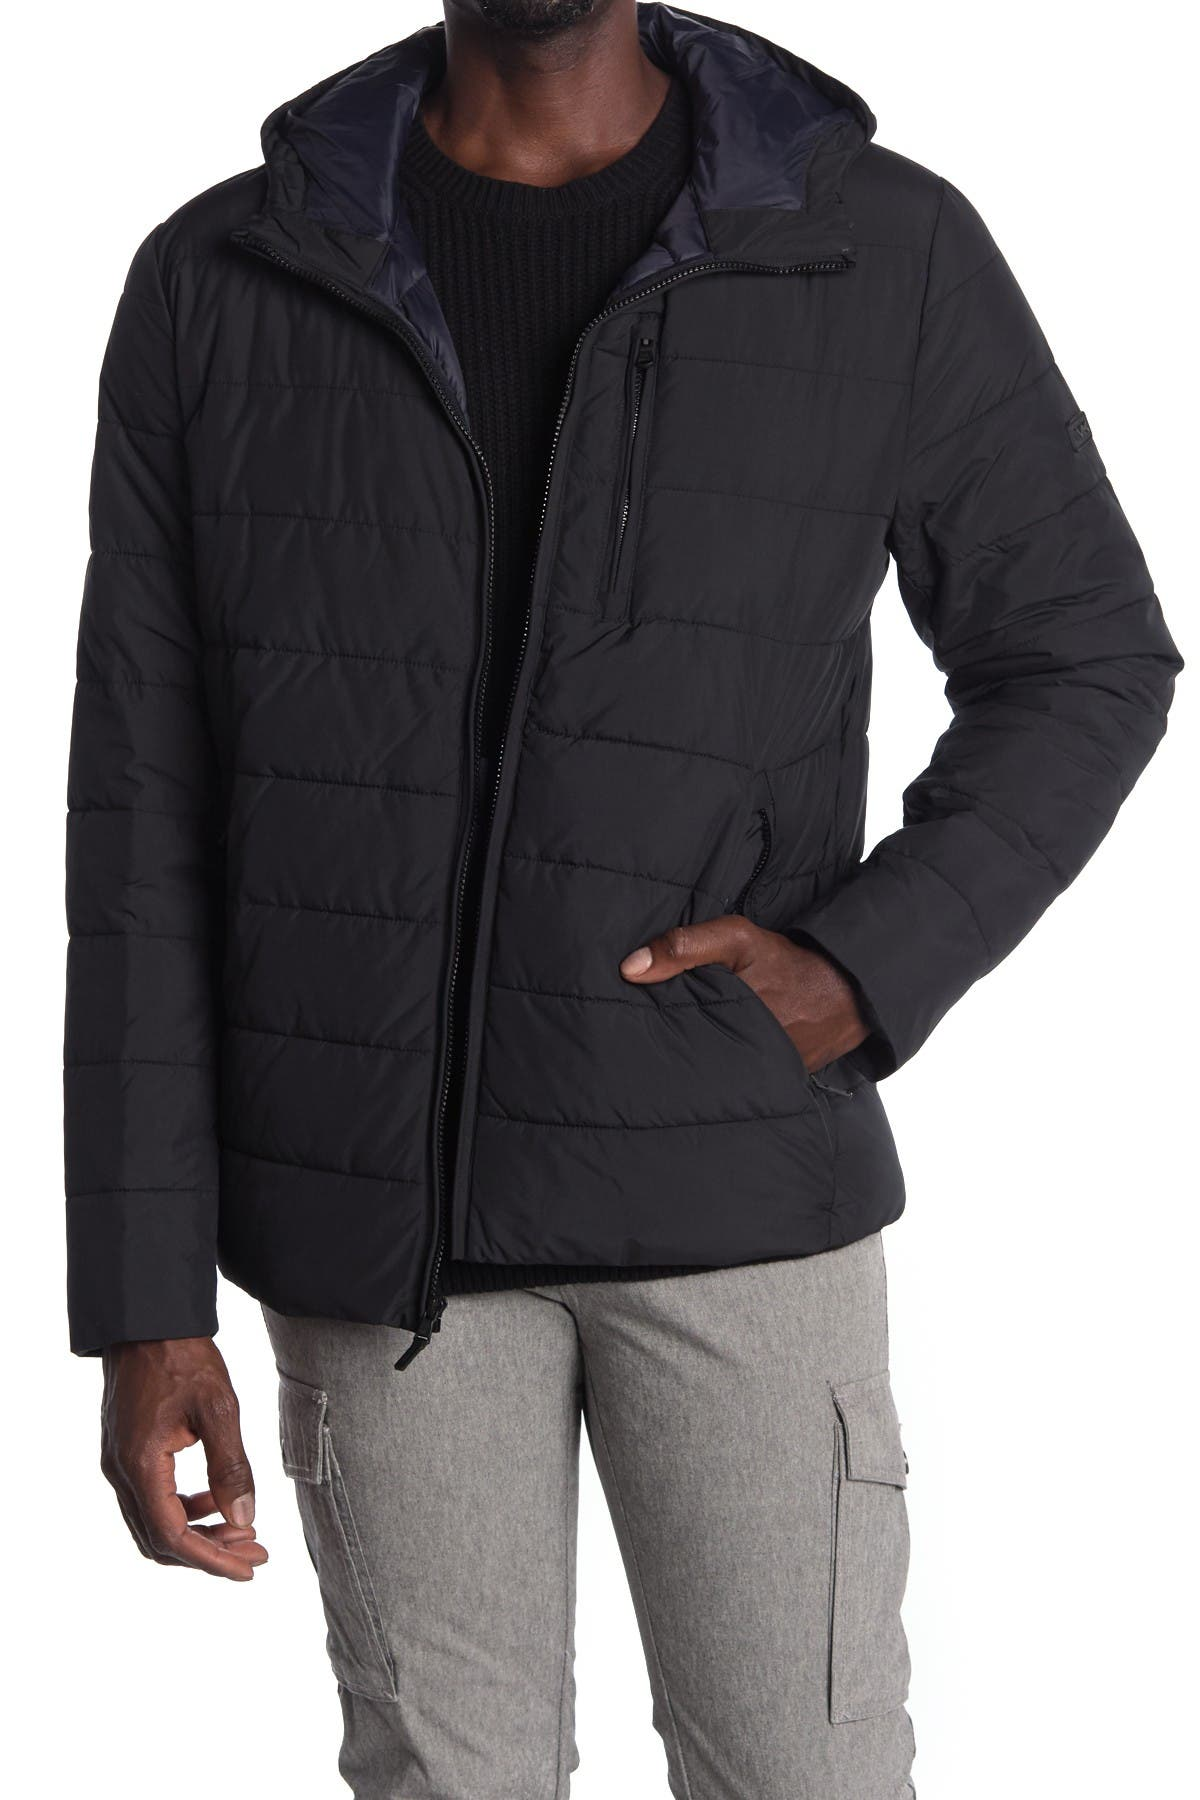 Image of Michael Kors Hooded Puffer Jacket